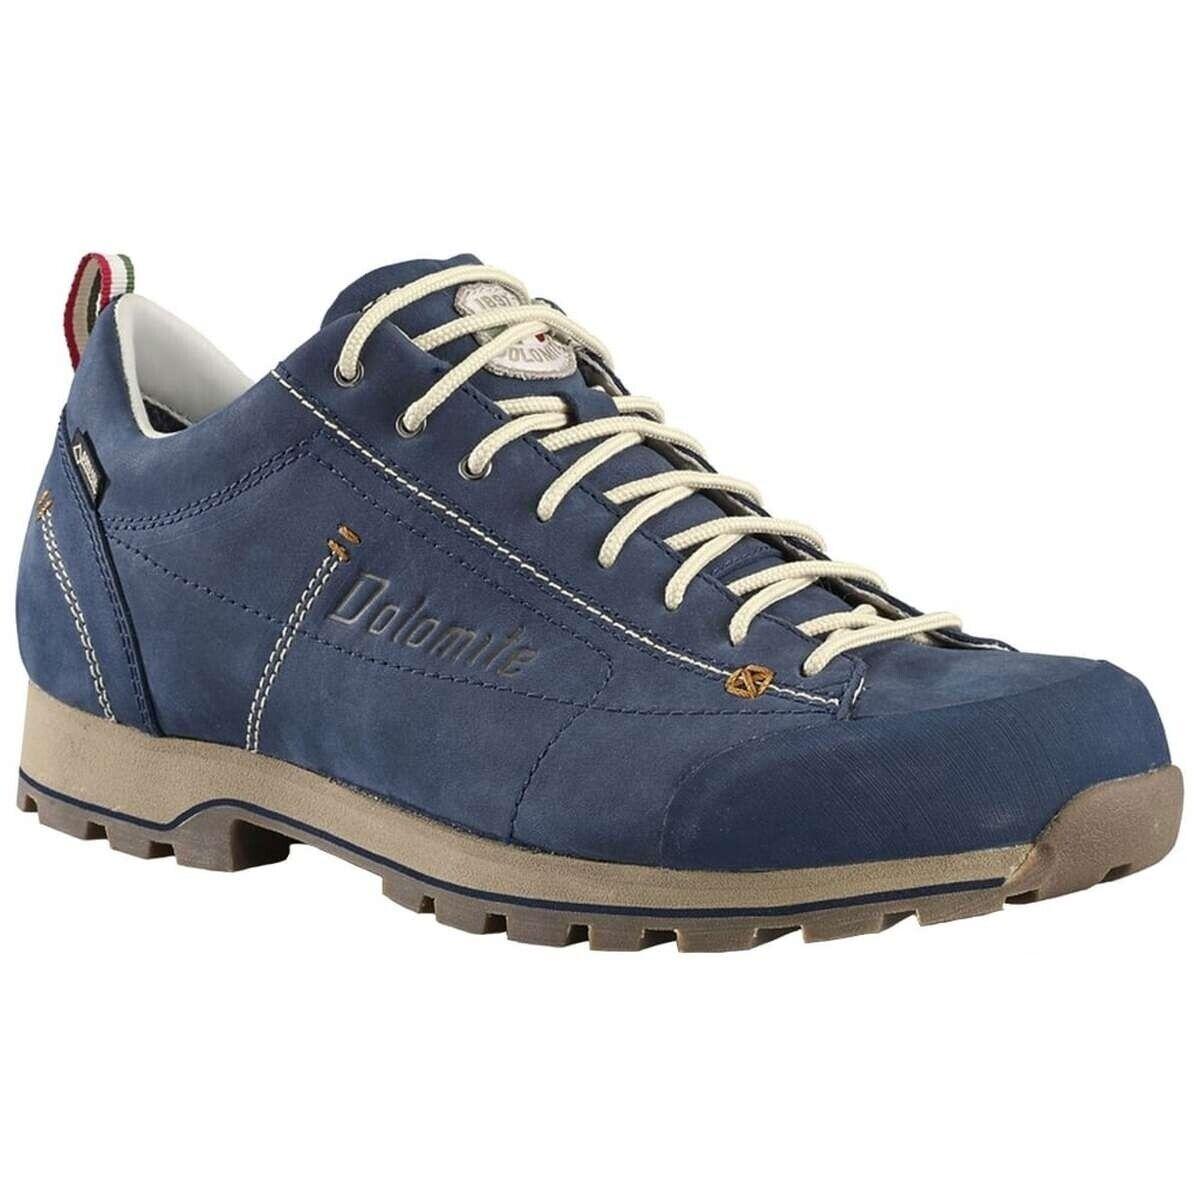 Dolomita cinquantaquattro Baja FG GTX Hombres Para hombres Cuero Caminar calzado goretex